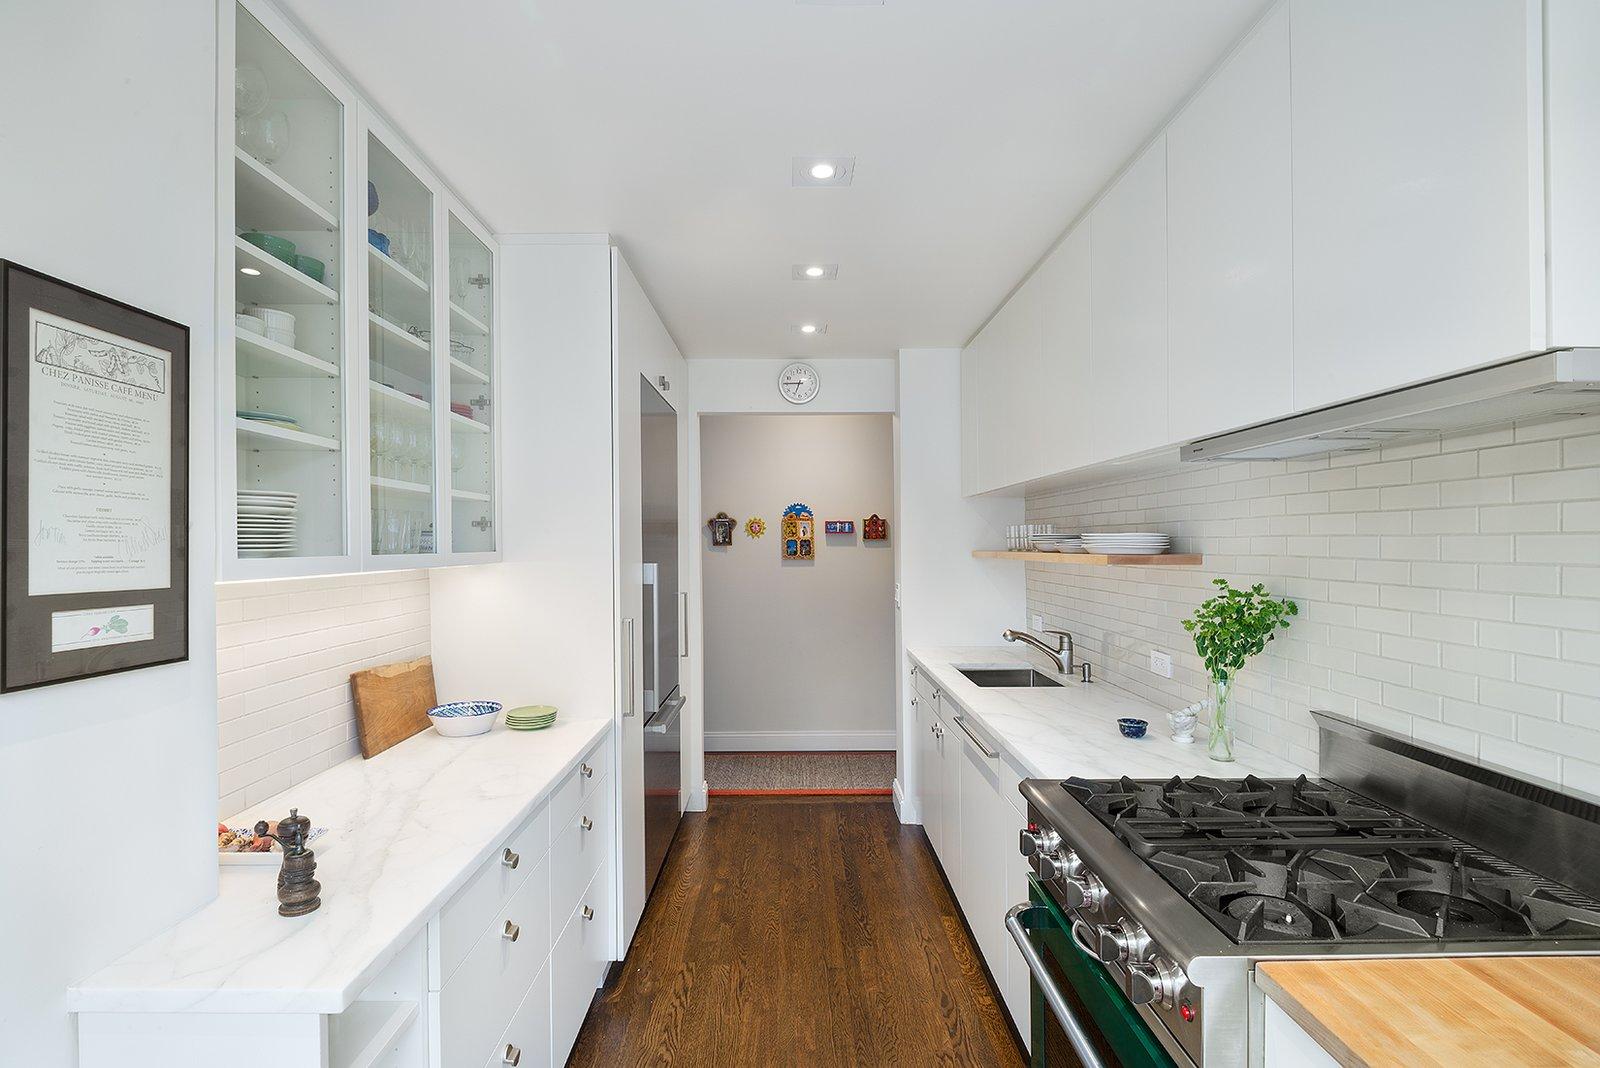 https://images.dwell.com/photos-6063391372700811264/6133536027597058048-large/upper-east-side-kitchen-renovation.jpg